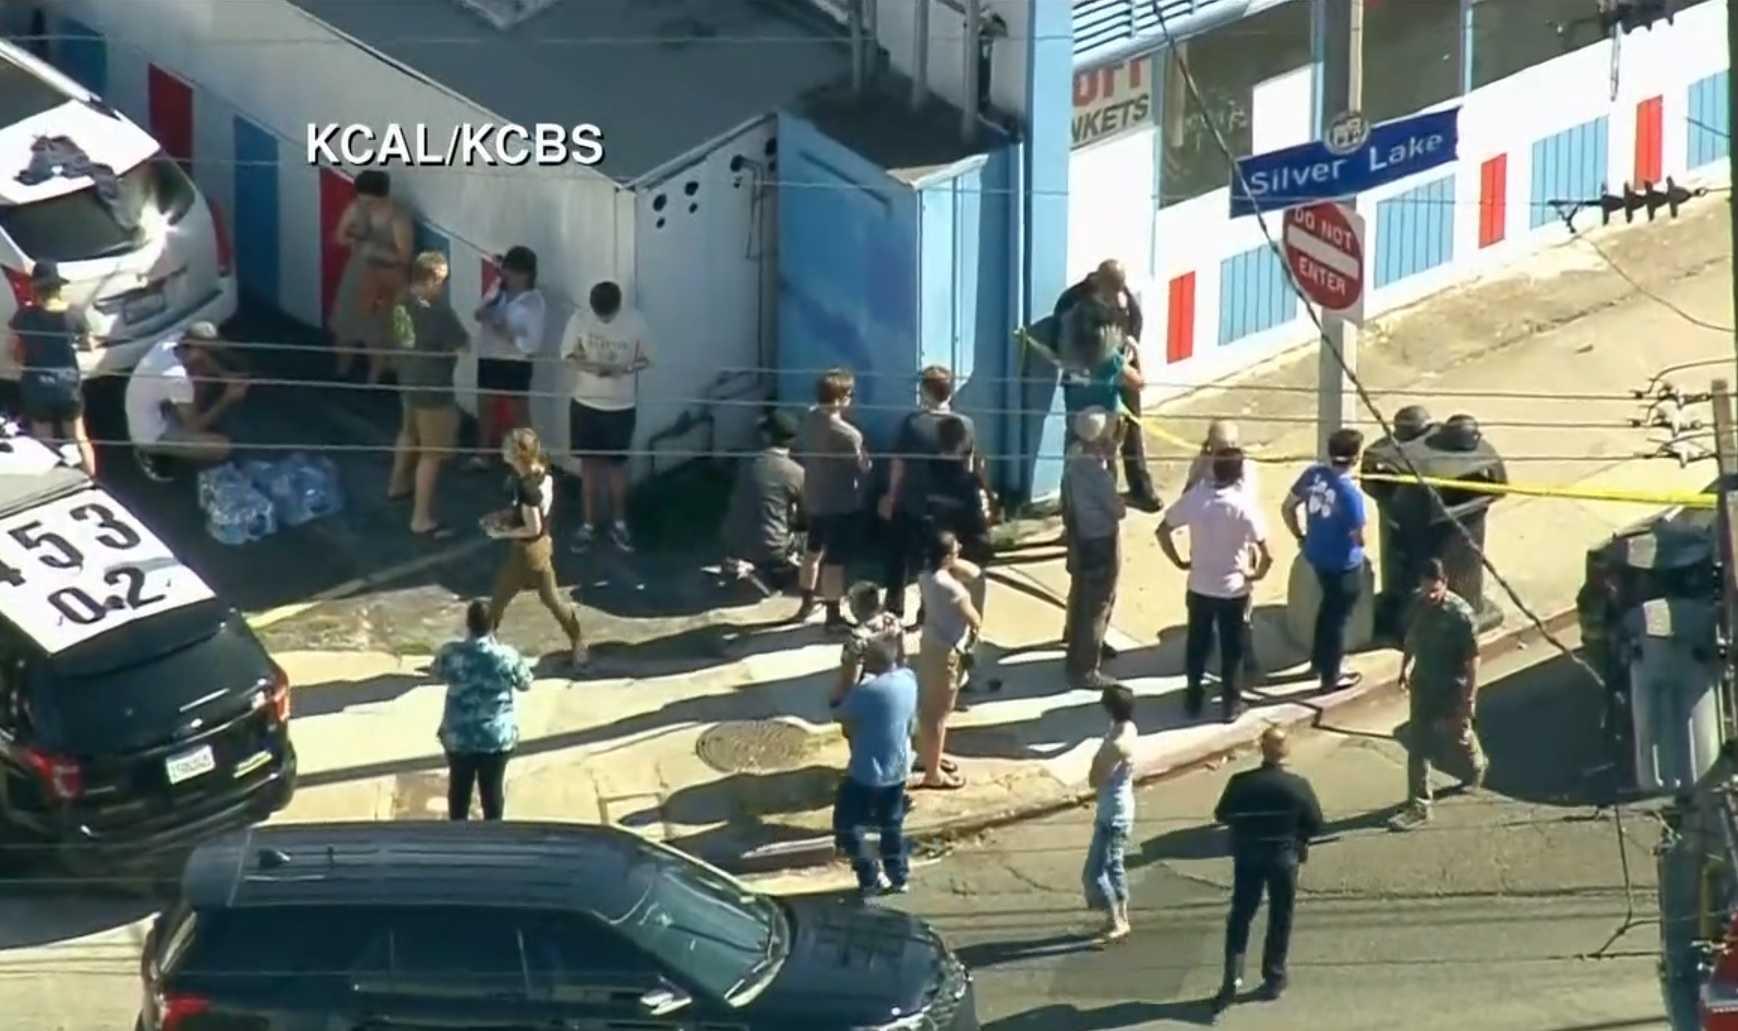 1 killed in standoff at Los Angeles Trader Joe's store